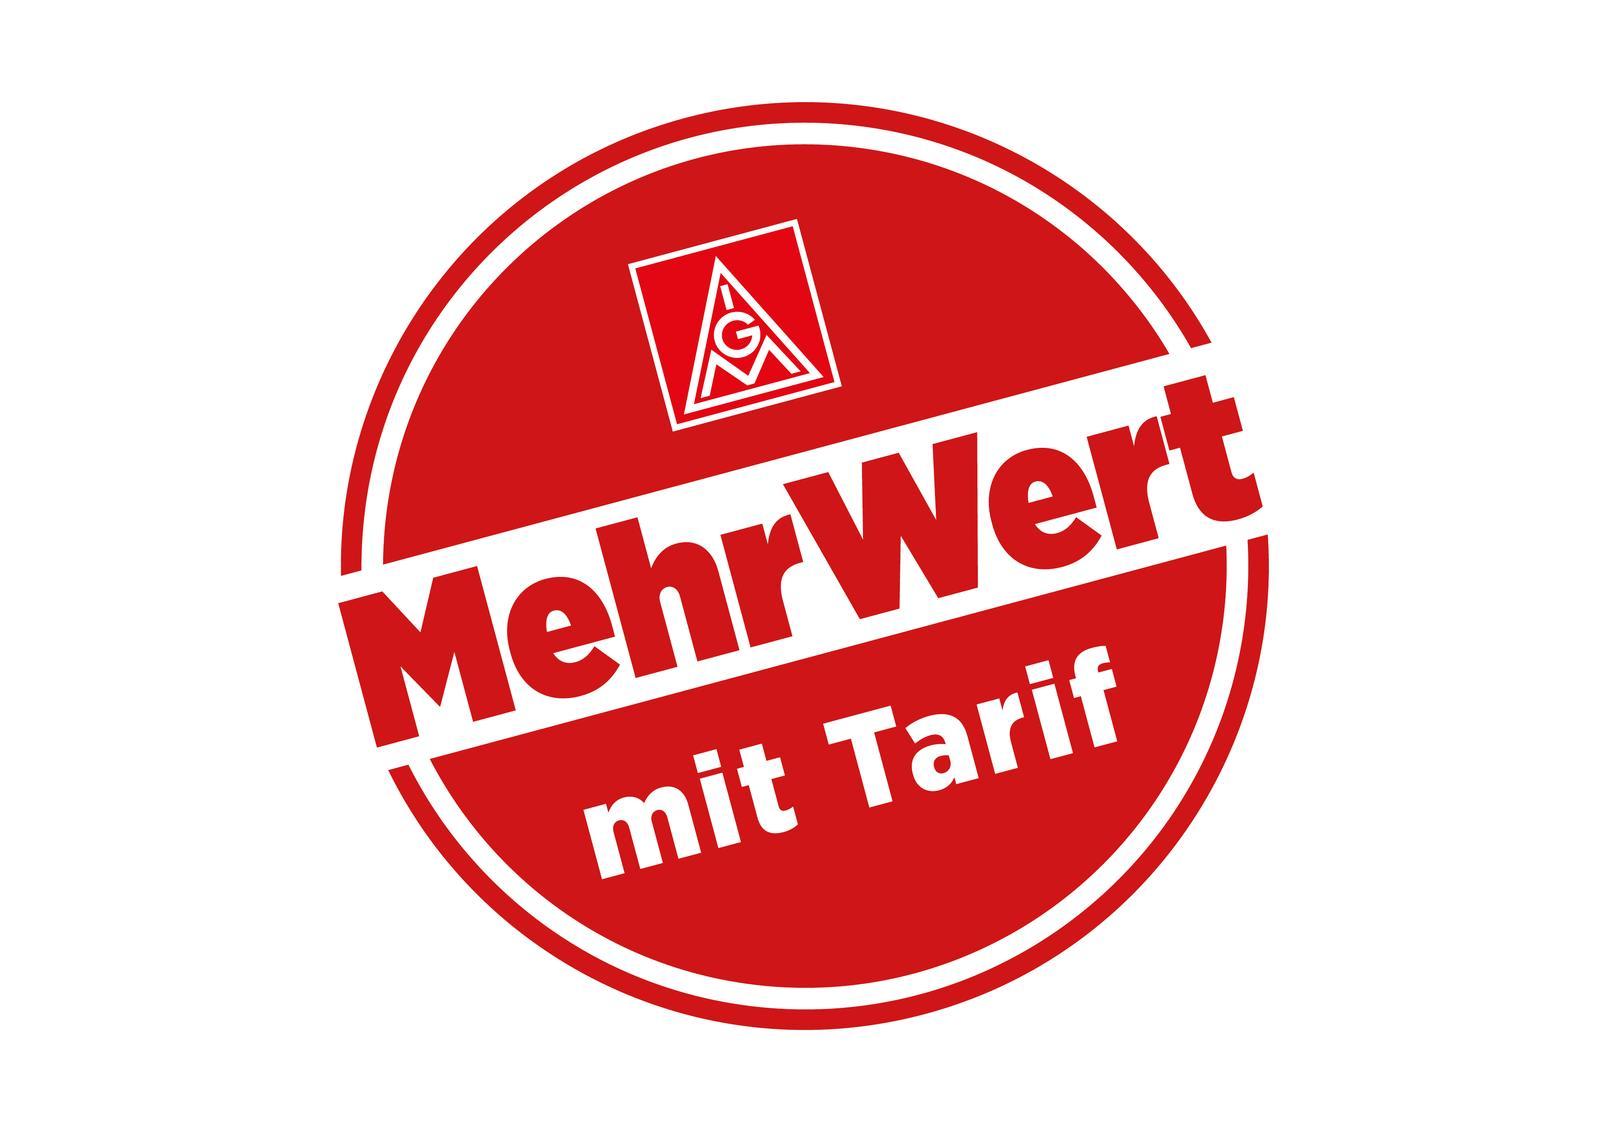 Landesverband Hessen Des Kfz Handwerks Kündigt Alle Tarifverträge